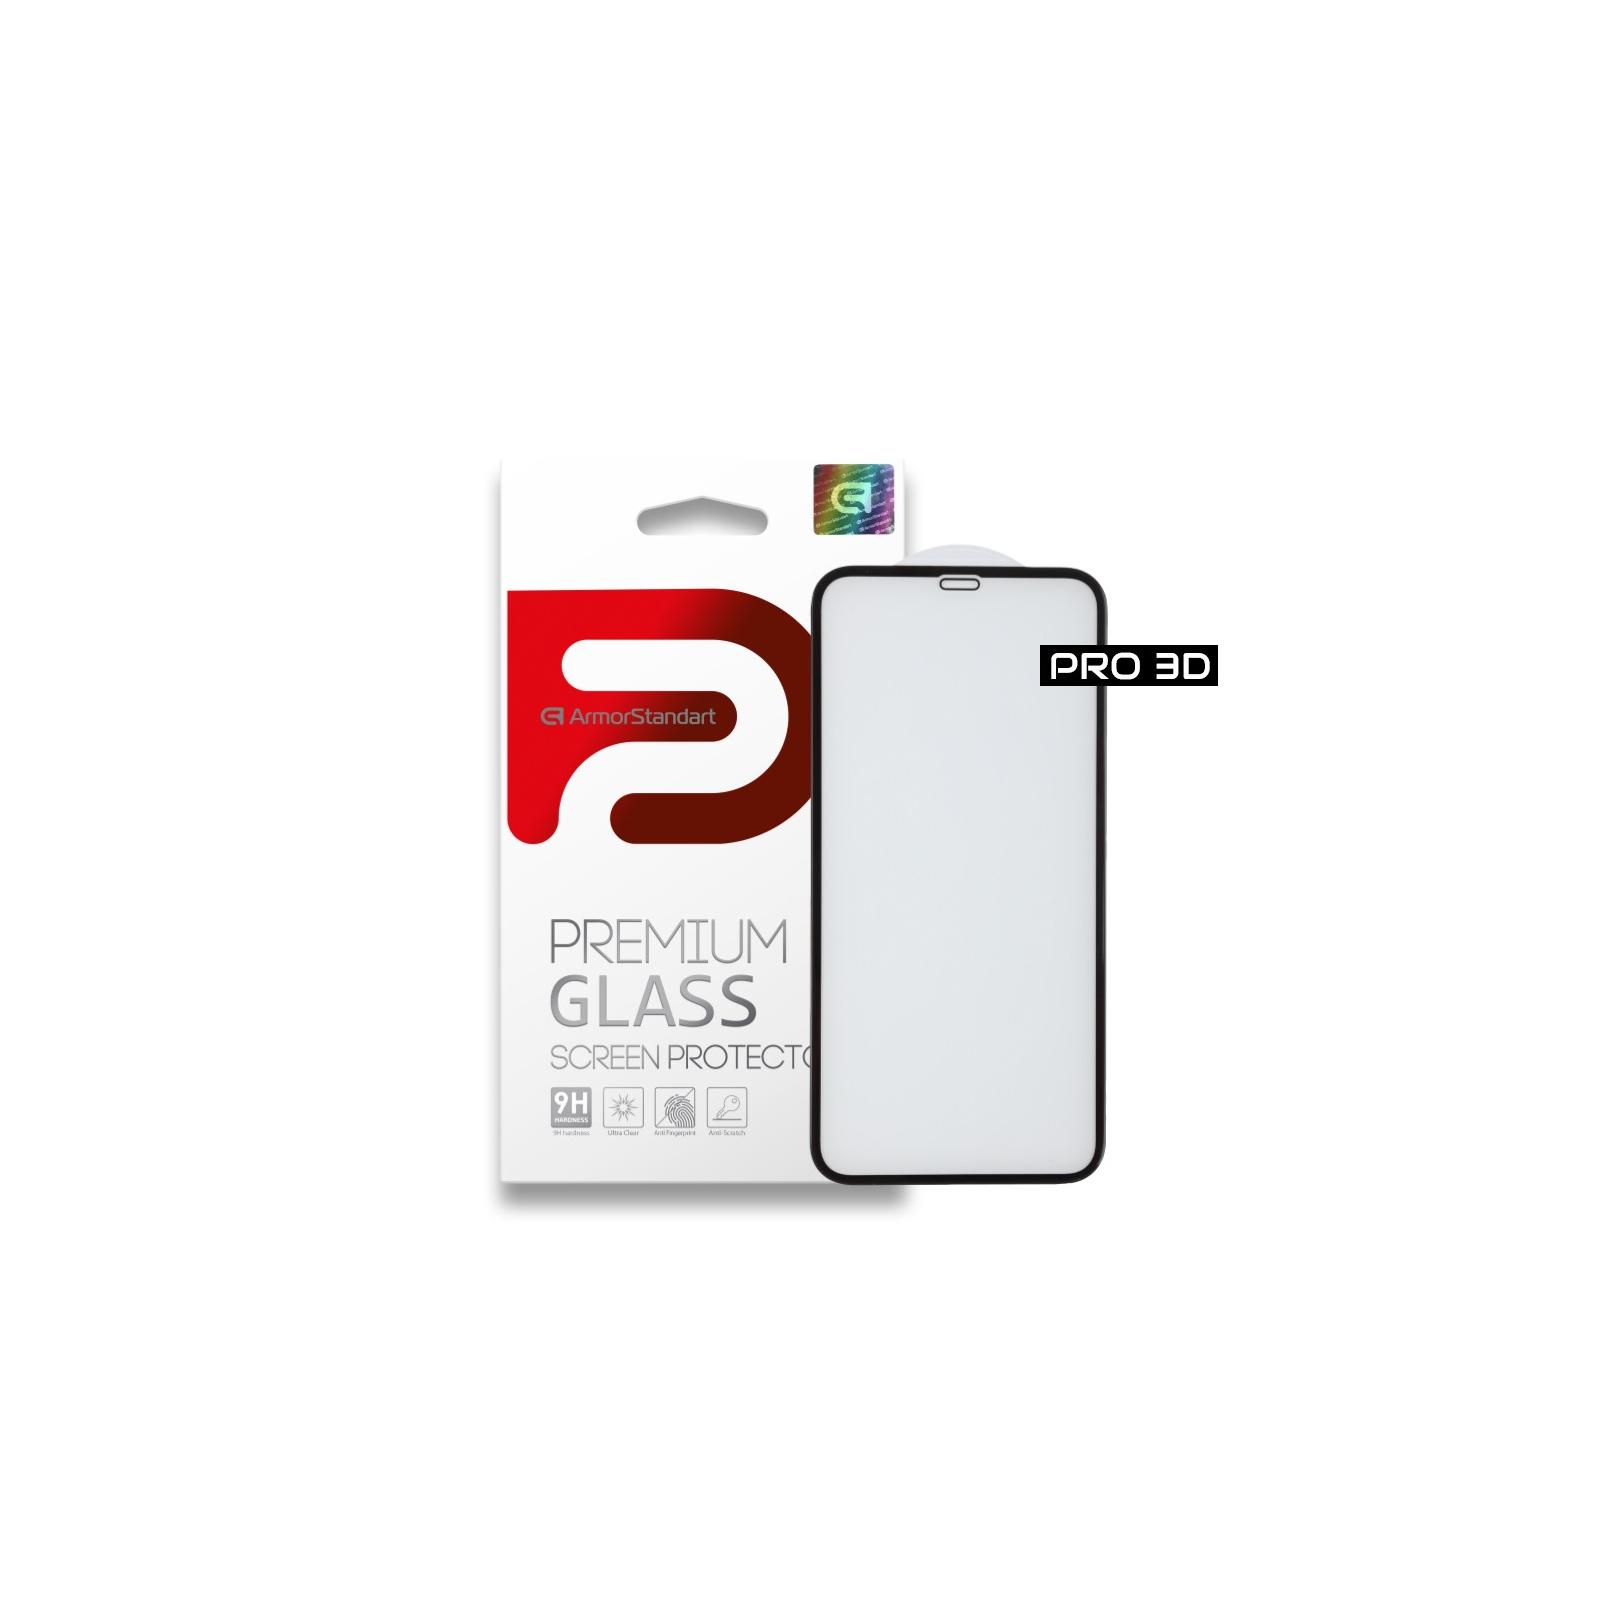 Стекло защитное Armorstandart для Apple iPhone XS/X Black (ARM55362-GP3D-BK)